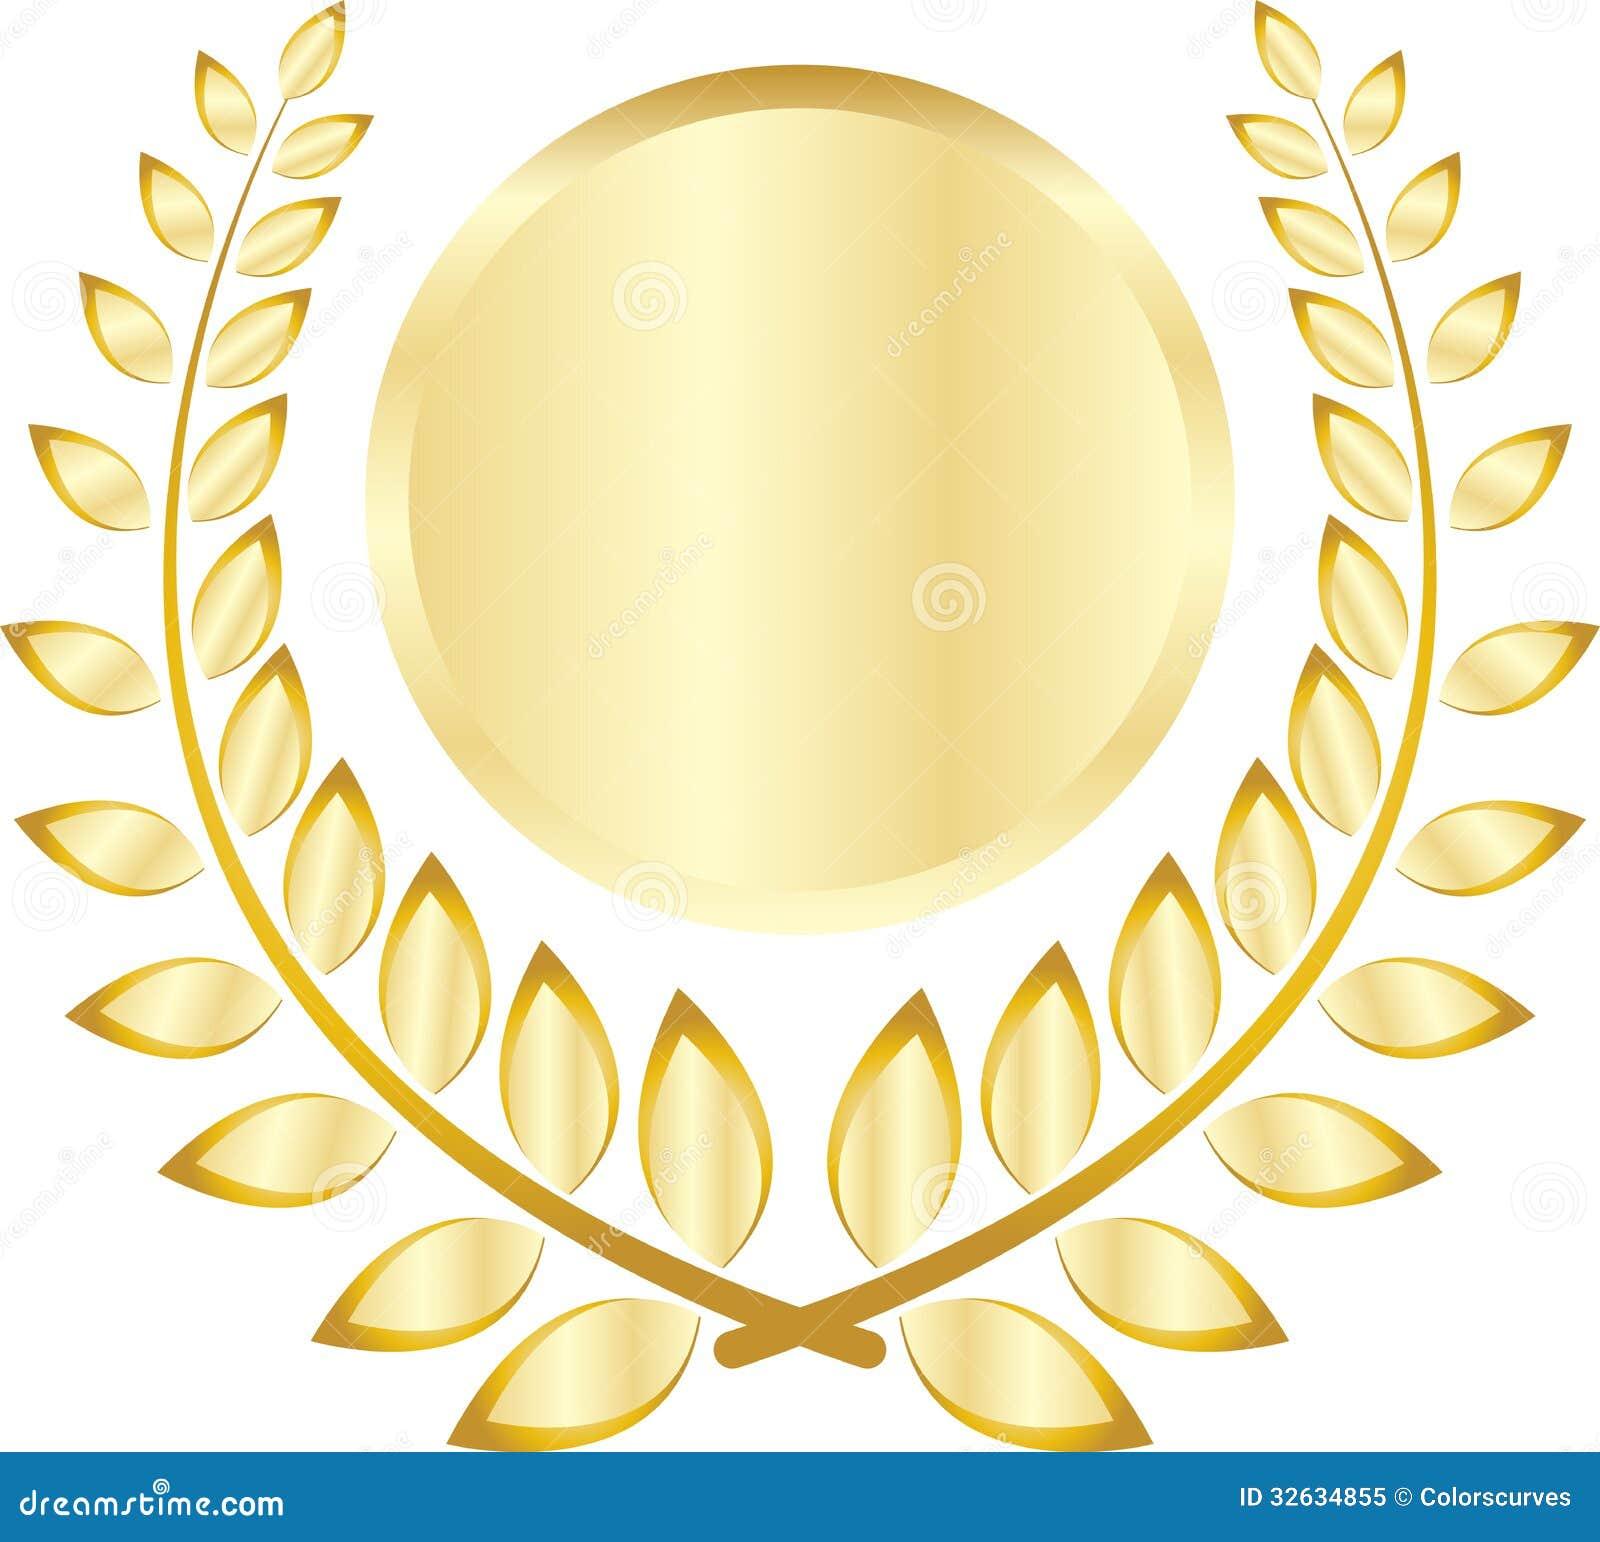 golden leaf crest royalty free stock photo image 32634855